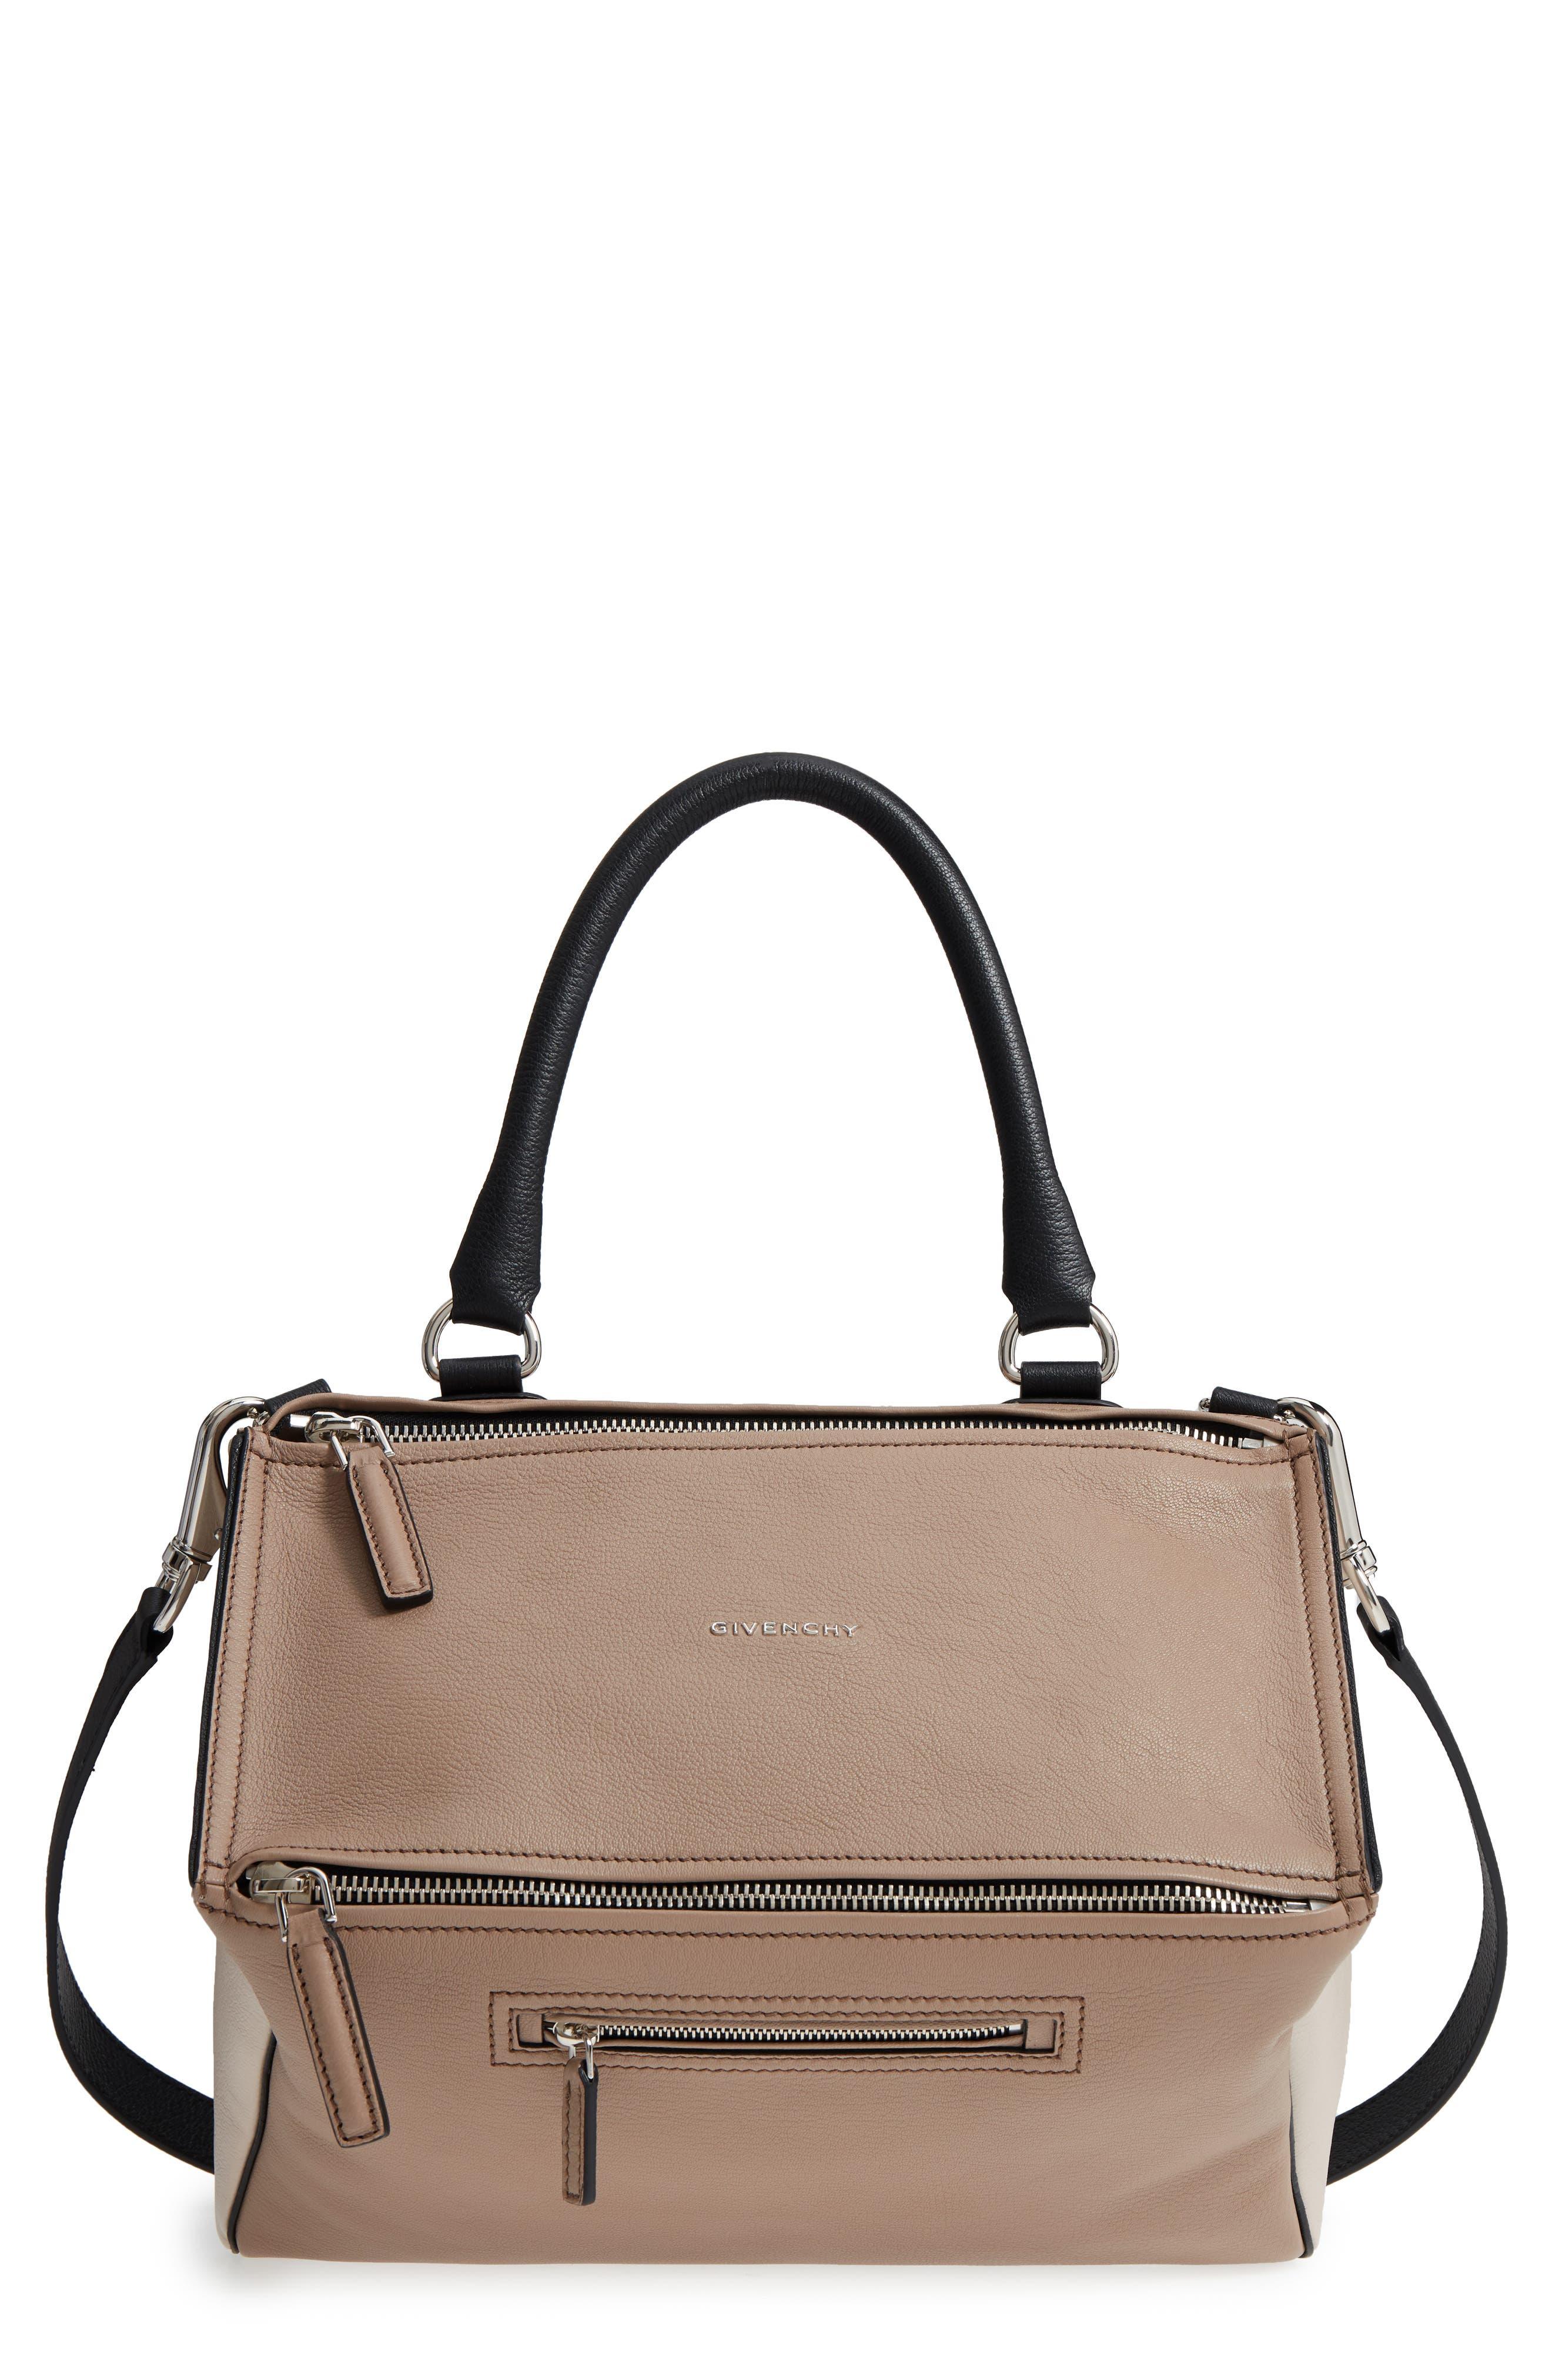 Medium Pandora Box Tricolor Leather Crossbody Bag, Main, color, 250